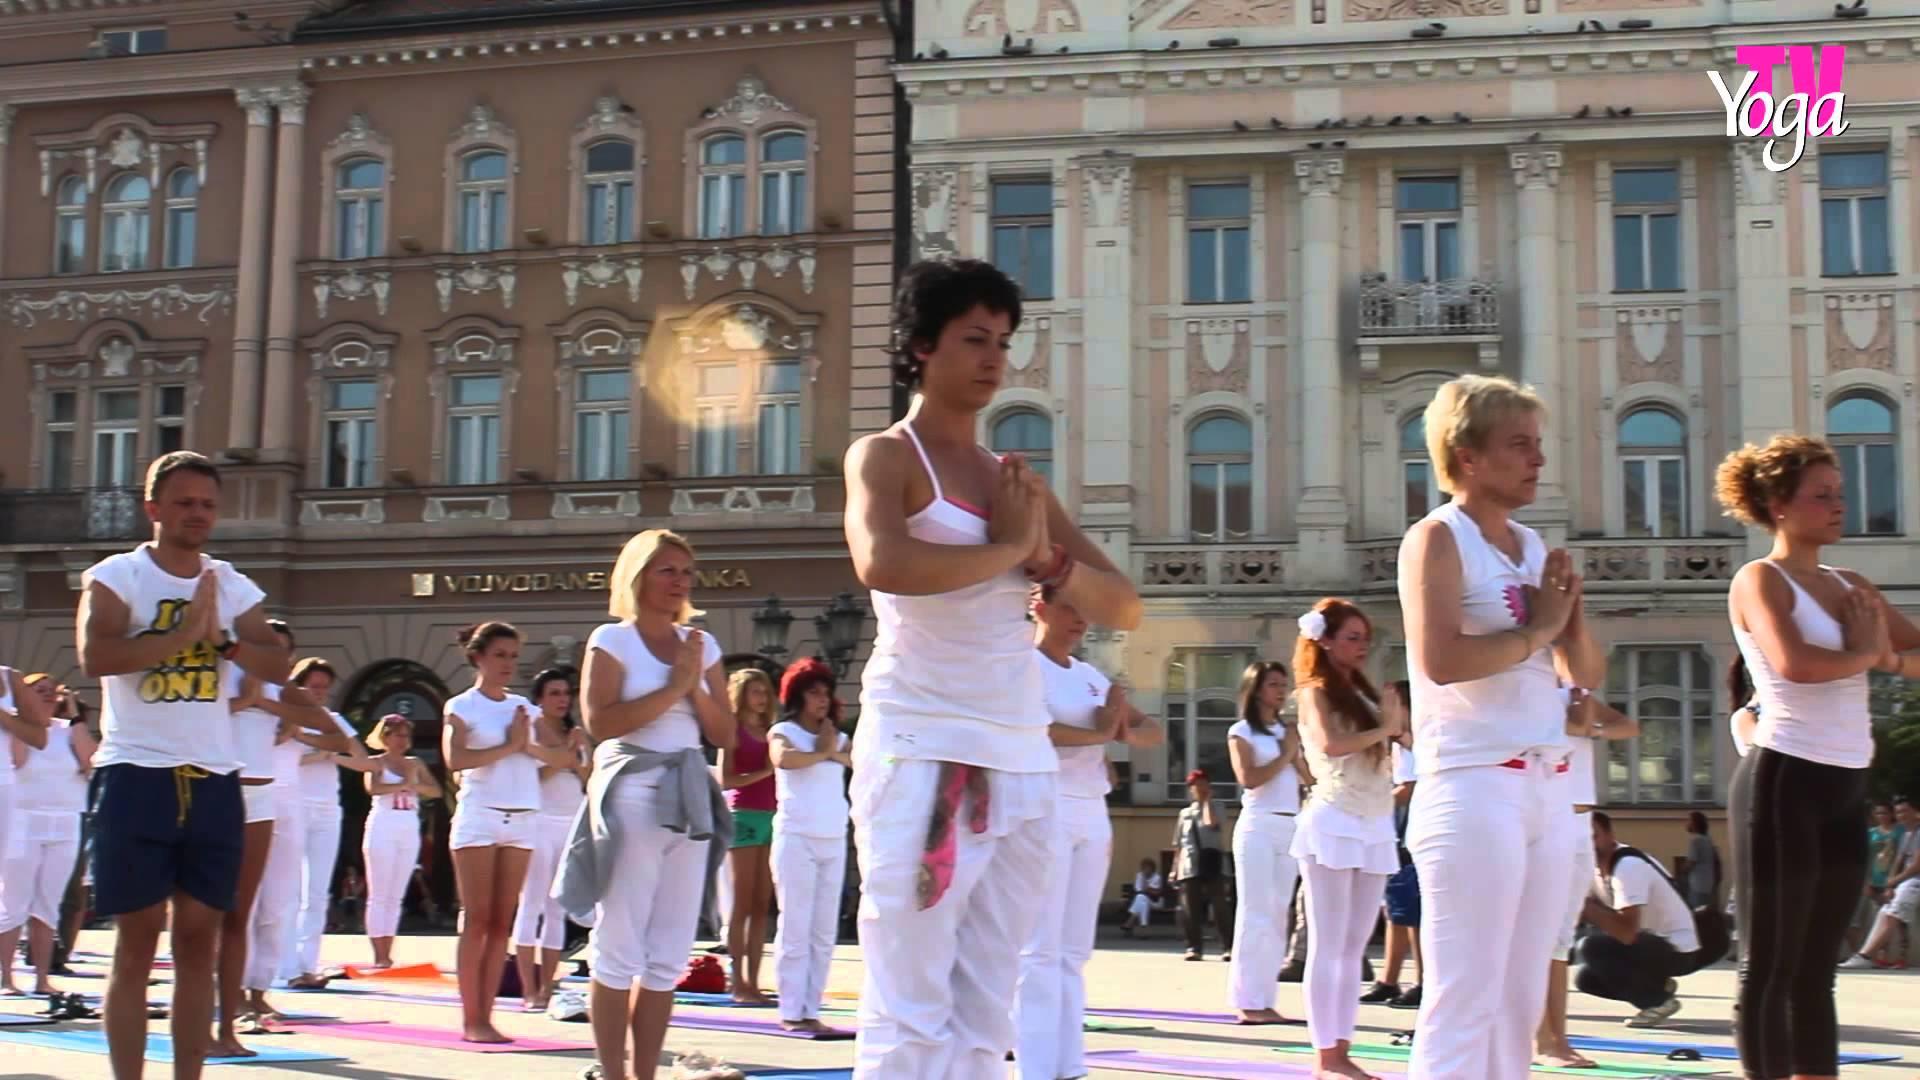 Sutra u Beogradu veliki joga performans